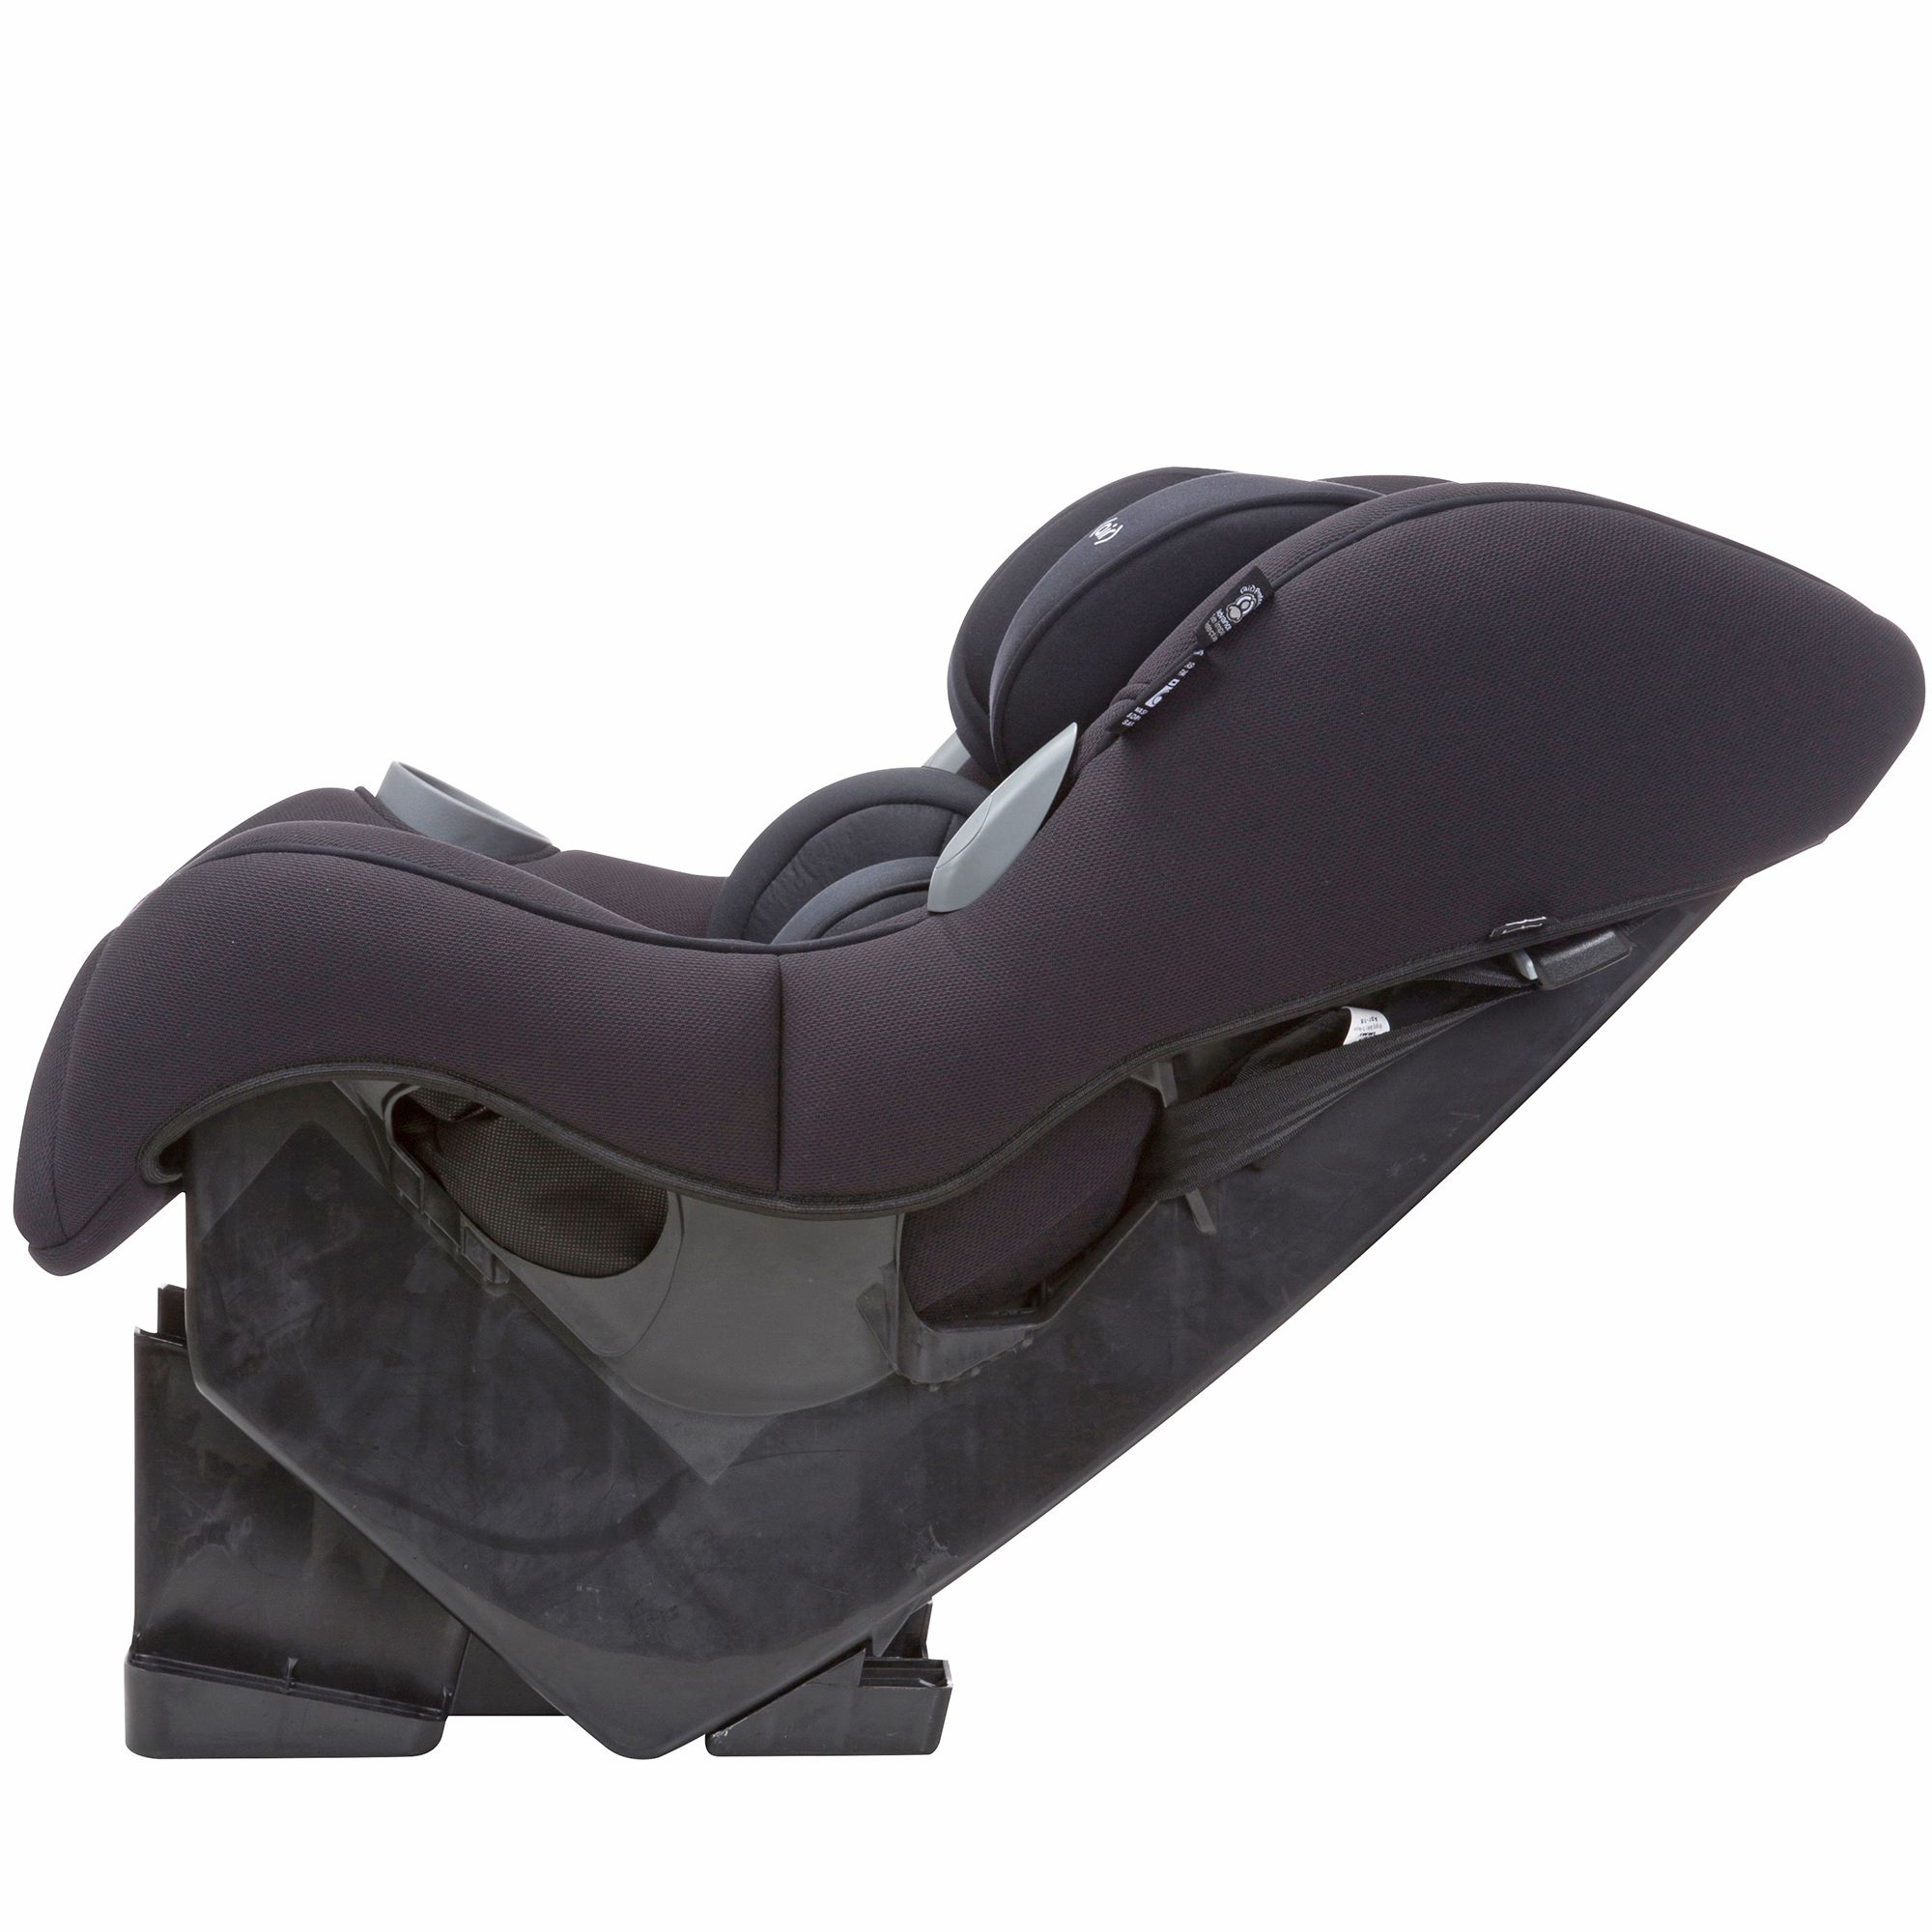 Maxi-Cosi® Pria™ 85 Max Convertible Car Seat in Night Black